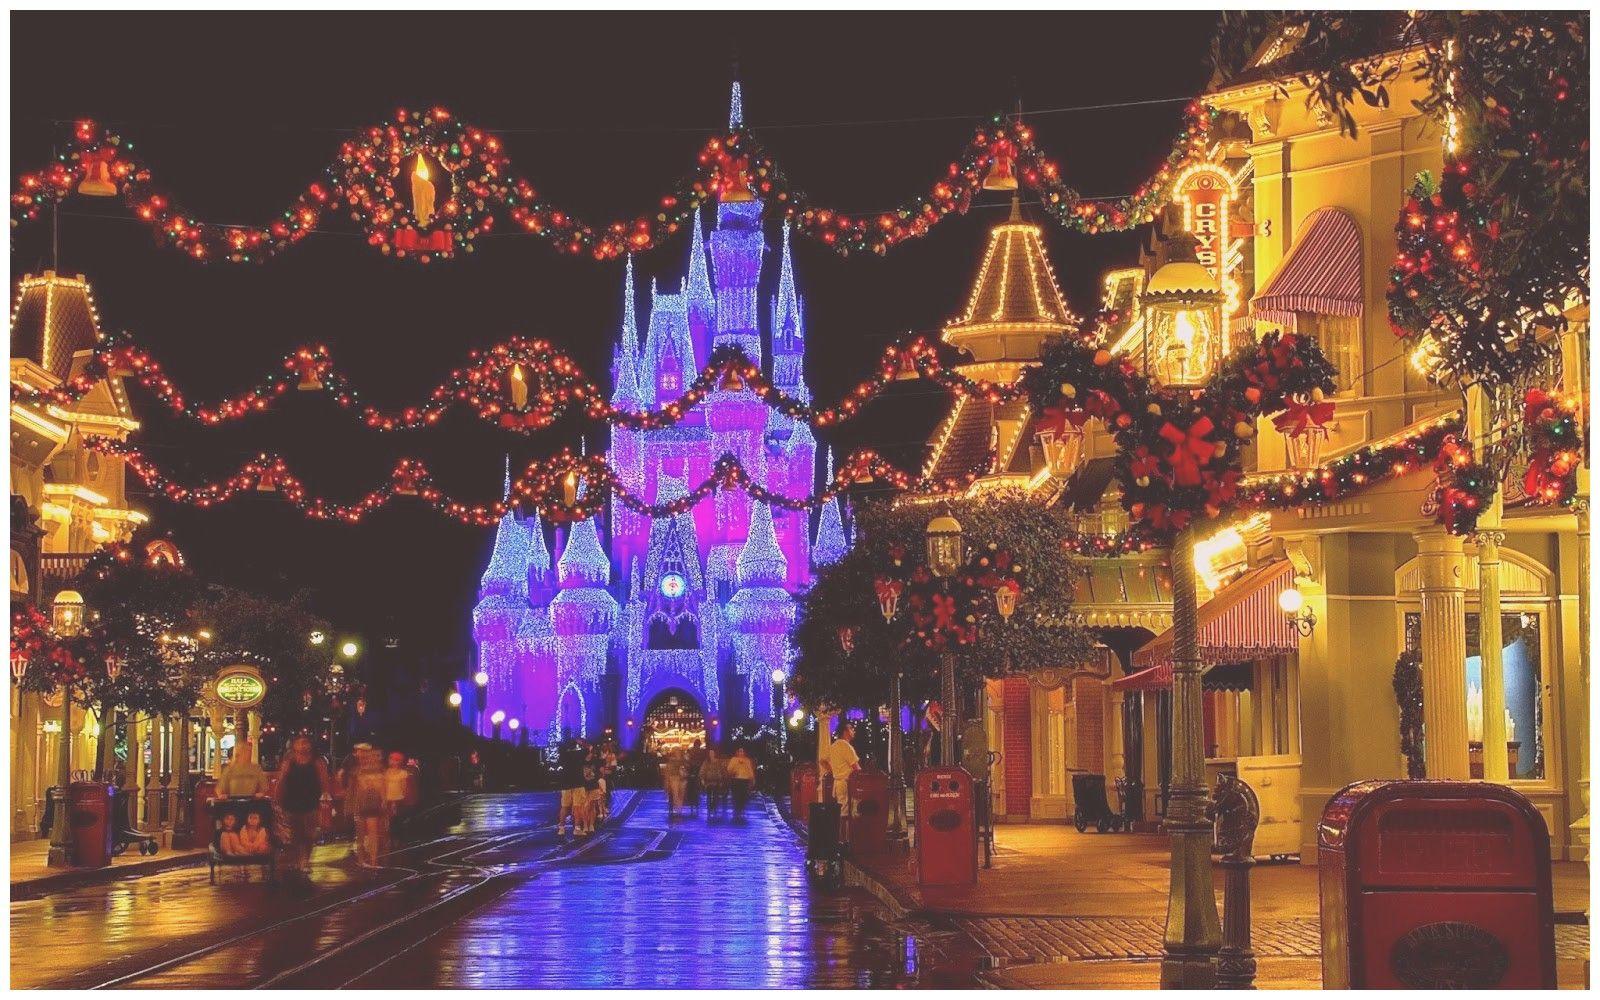 Disney Christmas Desktop Wallpapers On Wallpaperdog